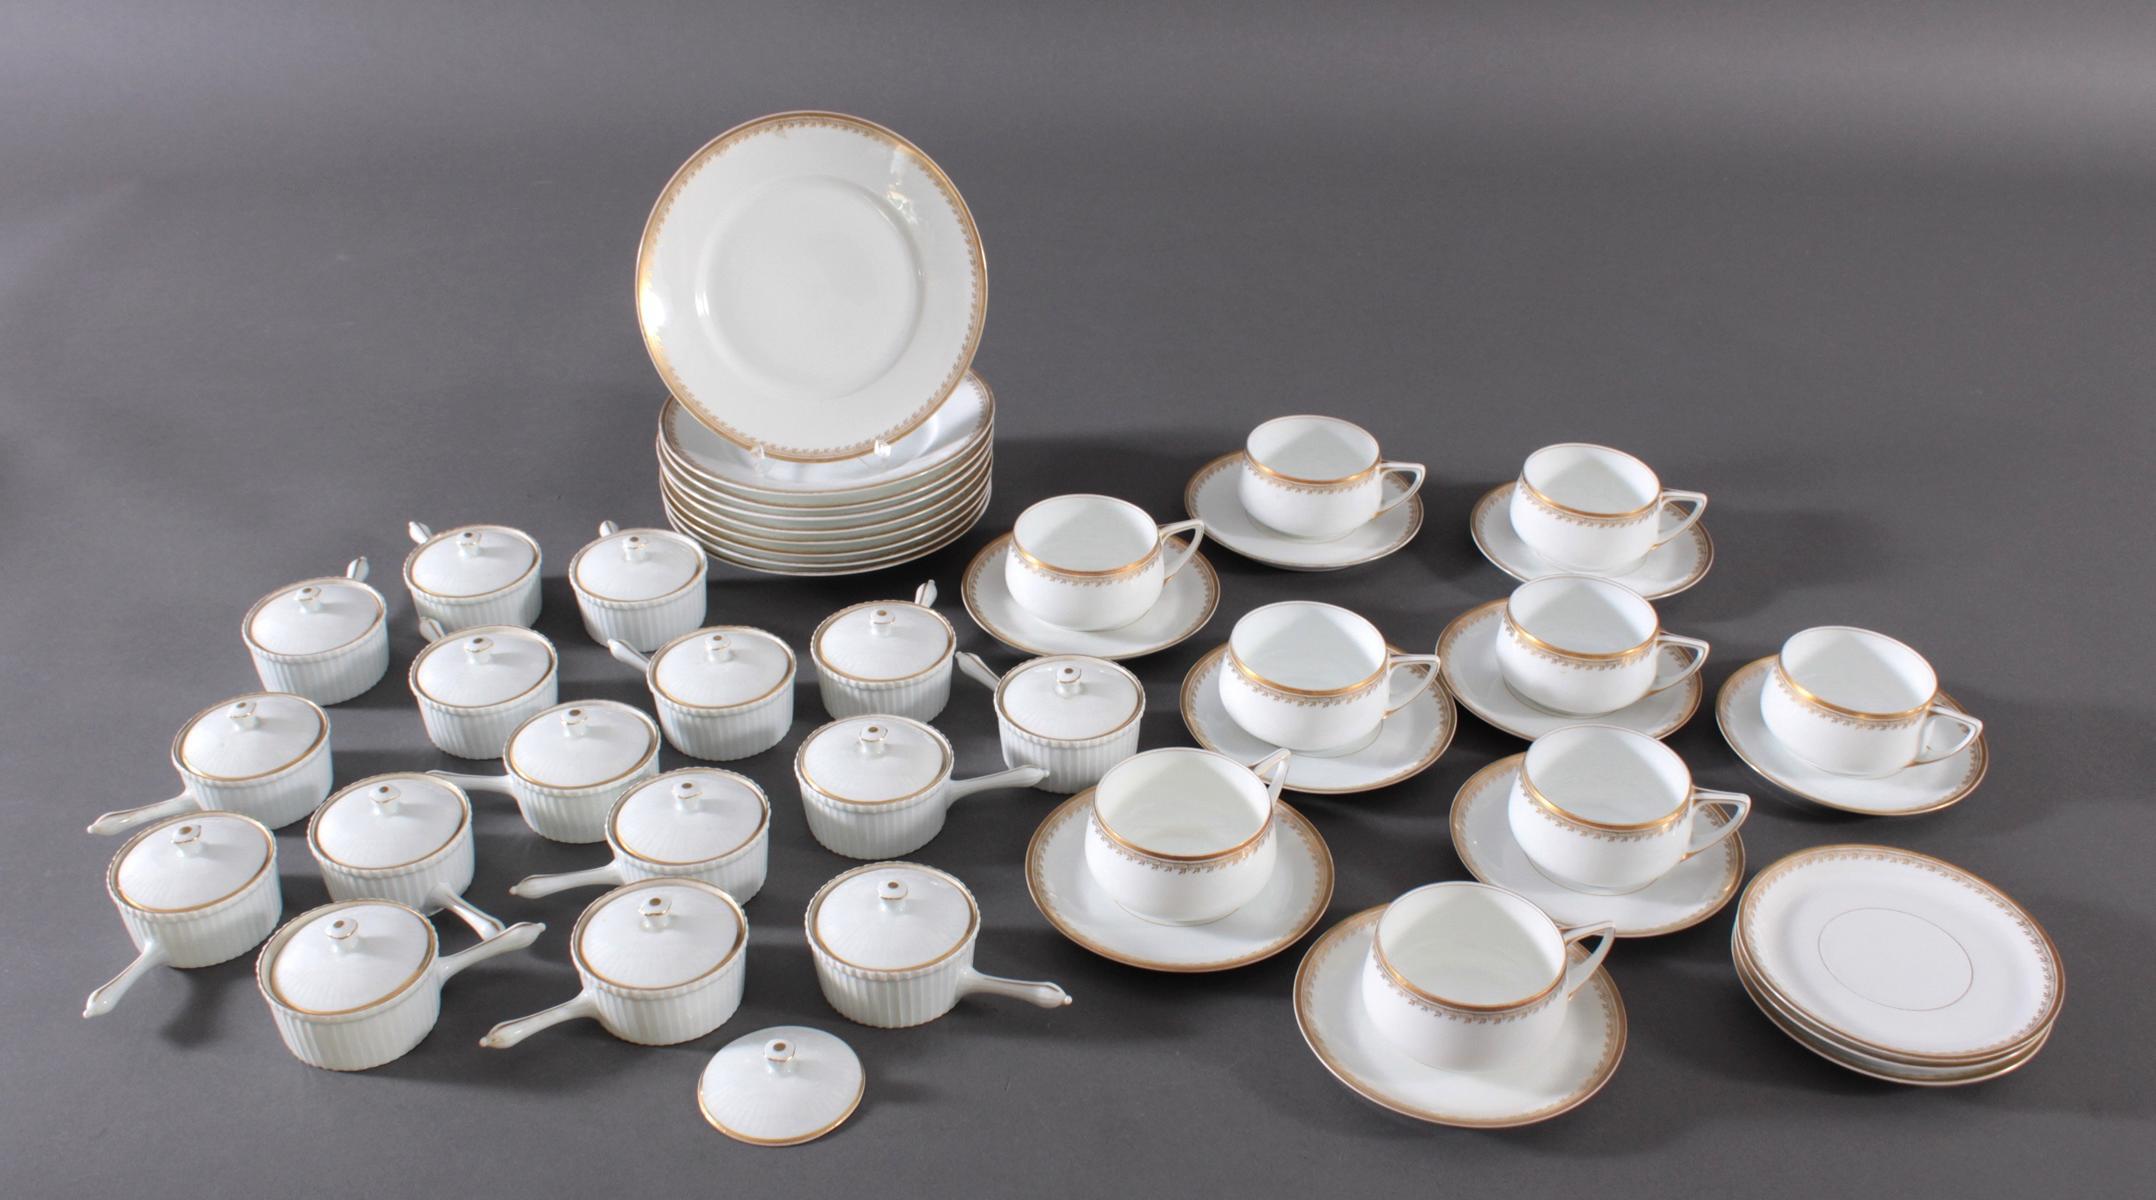 Rosenthal Porzellan-Teile, 48 Stück